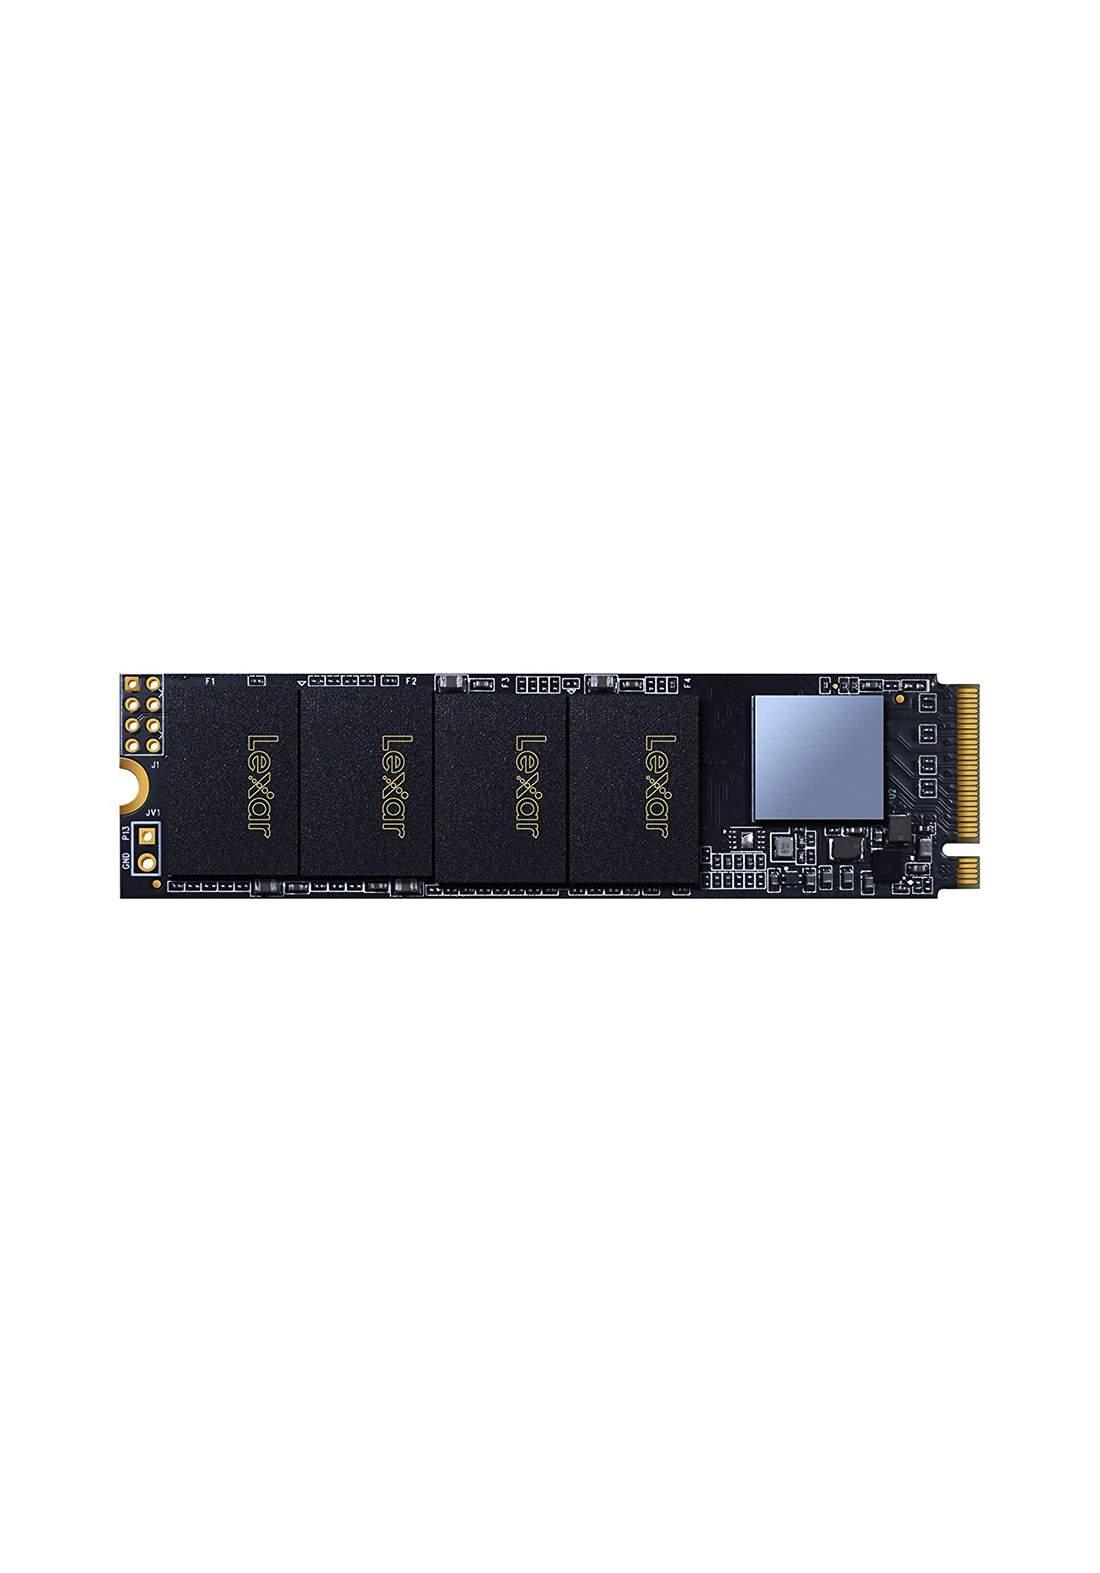 Lexar NM610 250GB M.2 NVMe 3D Solid State Drive